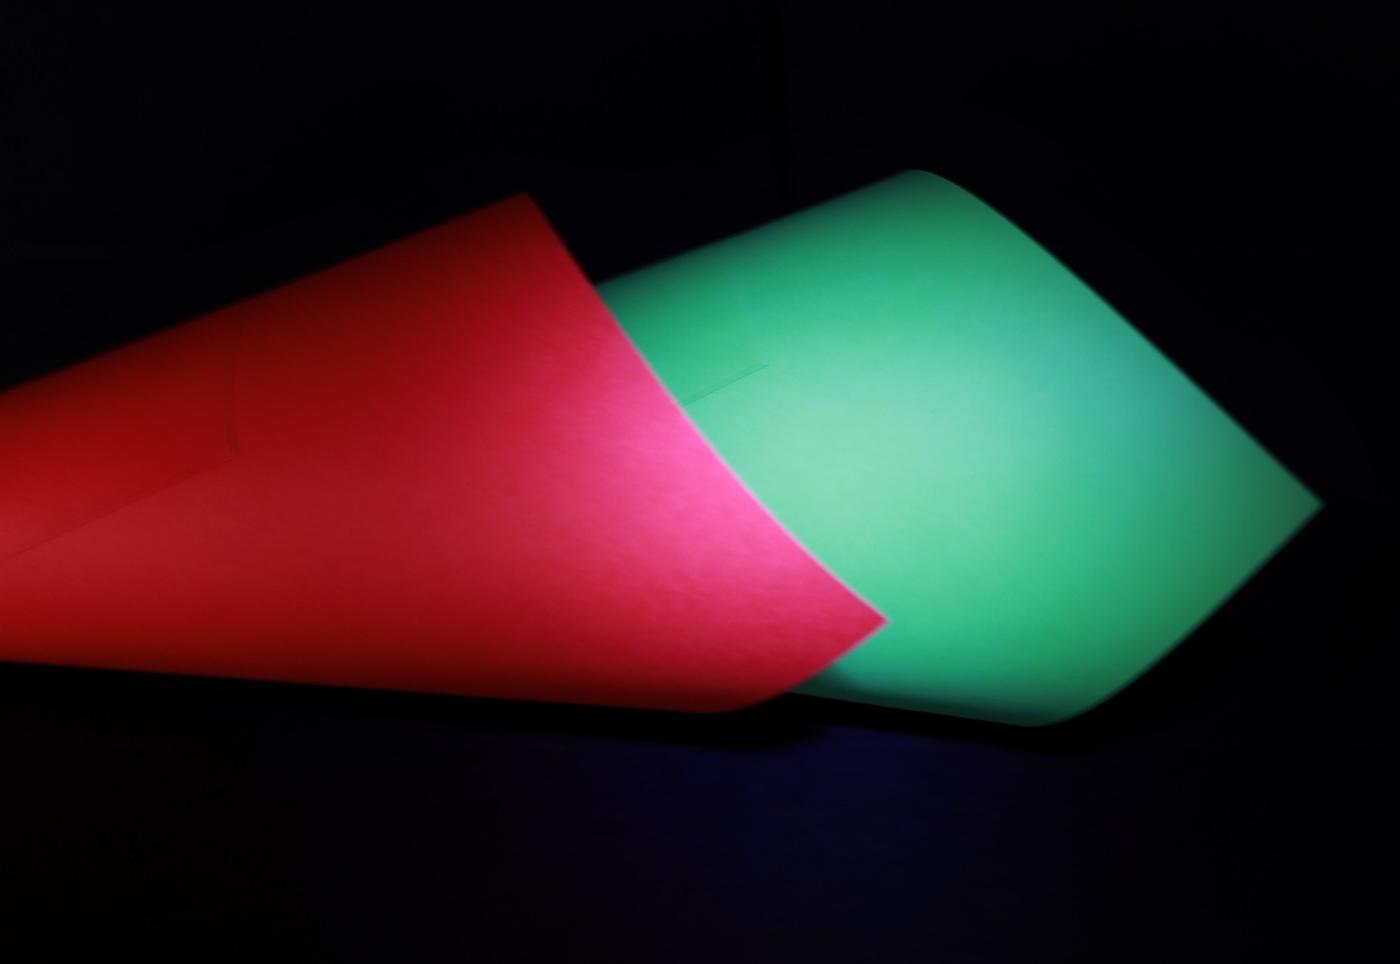 Rød/Grøn delt 3. plads